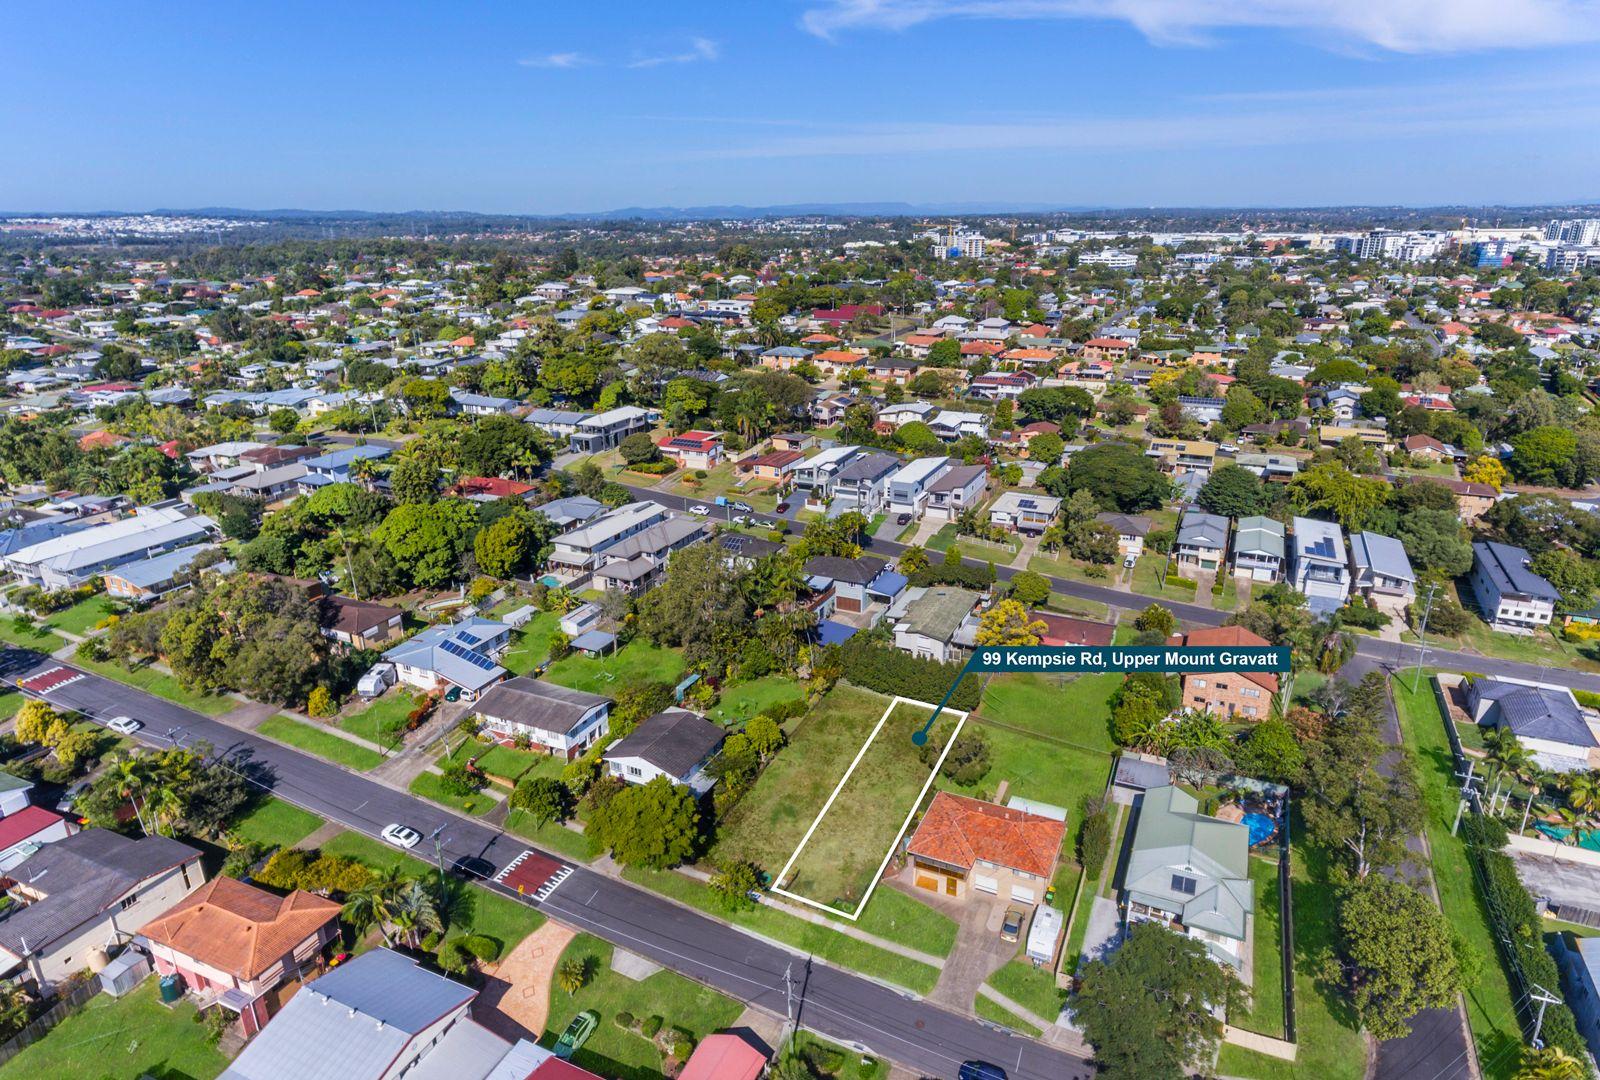 99 Kempsie Road, Upper Mount Gravatt QLD 4122, Image 2